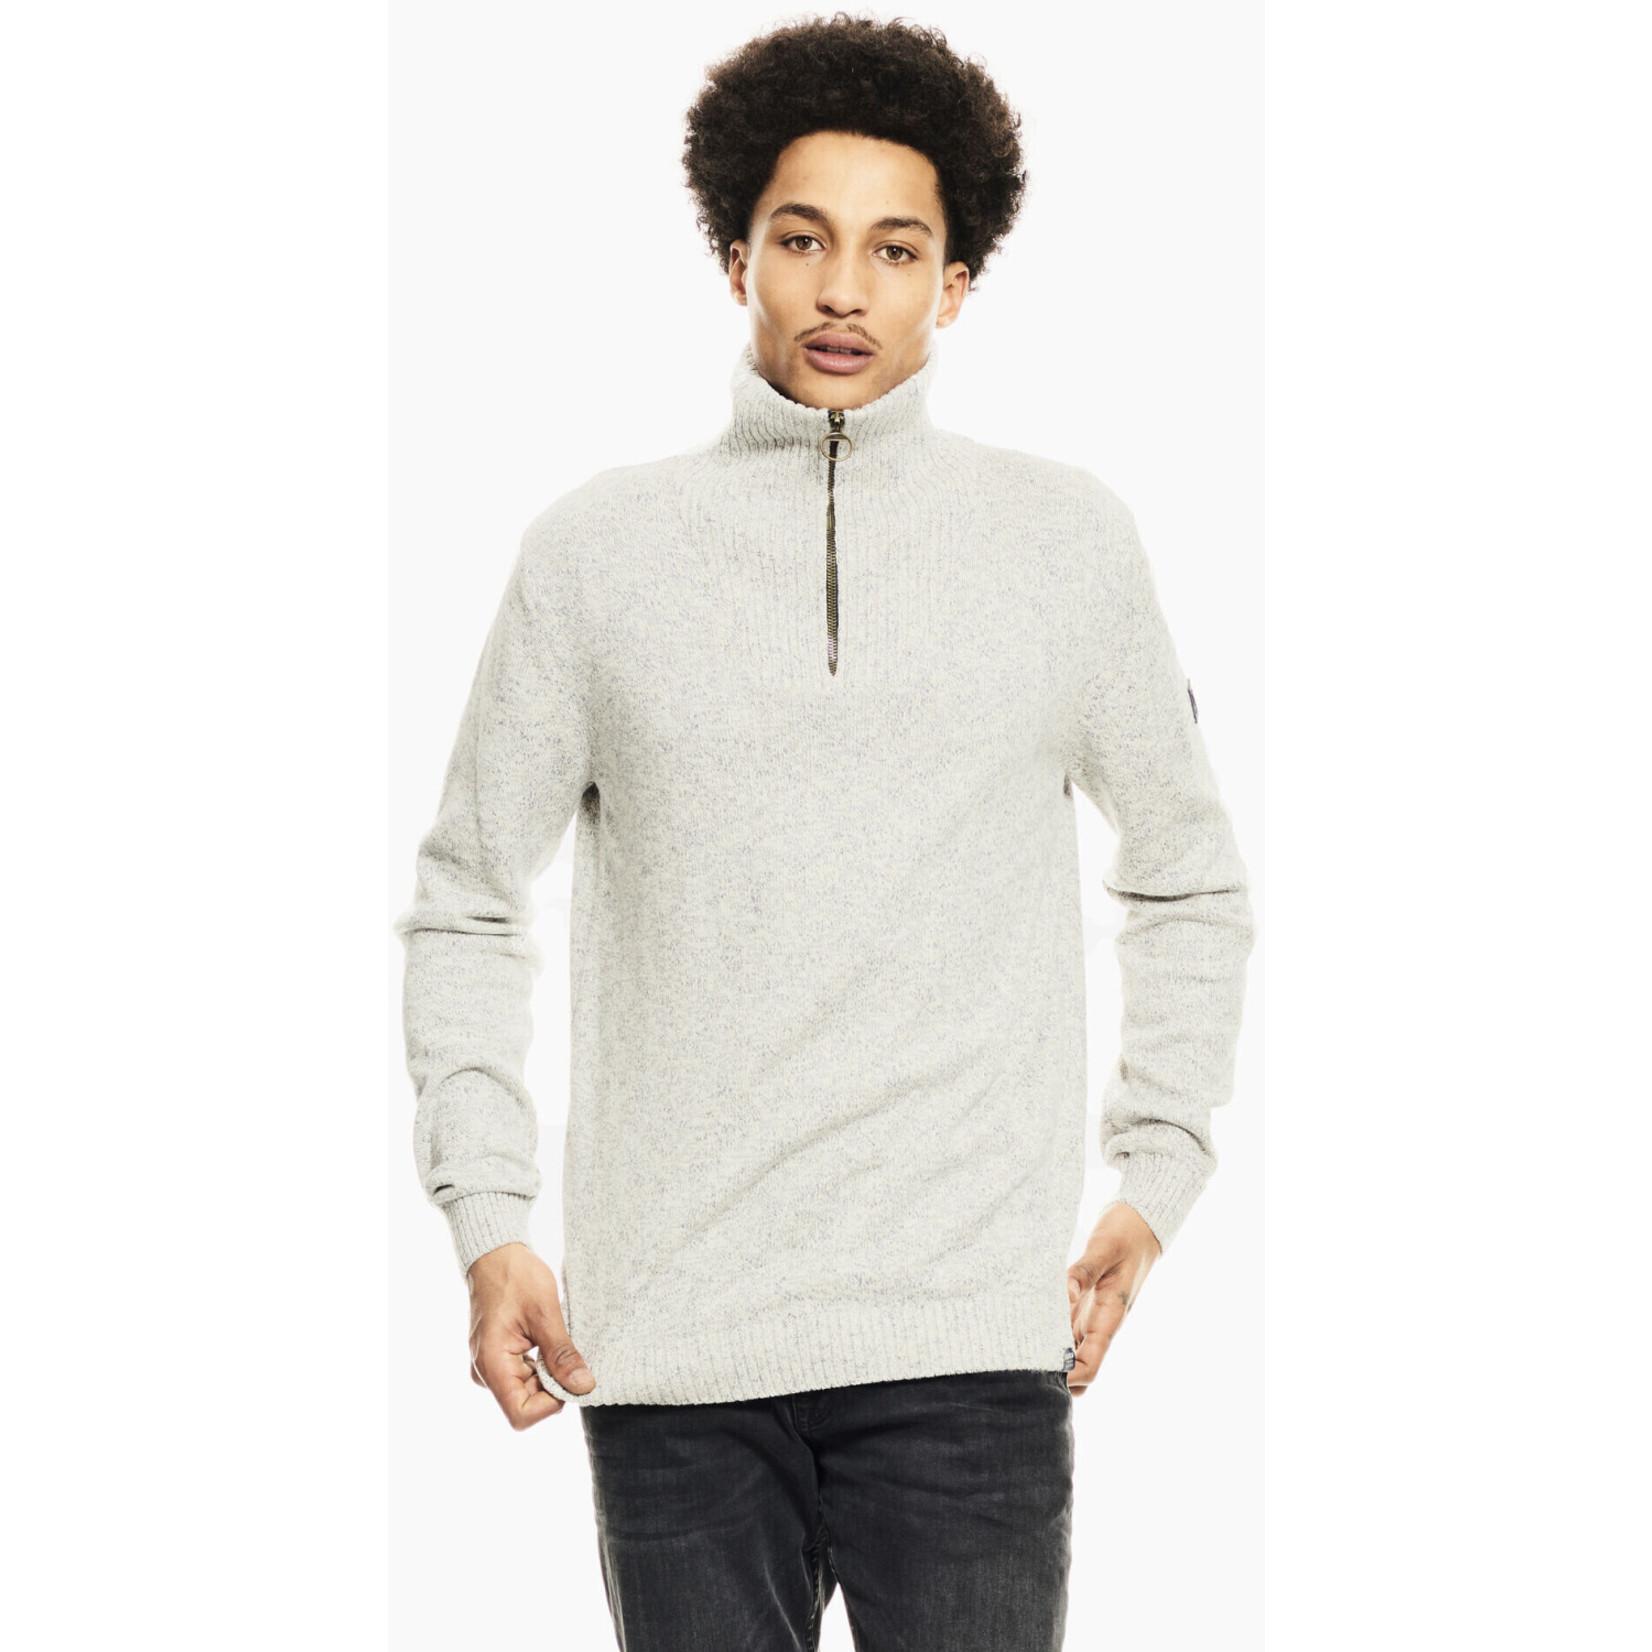 Garcia Garcia I11039 Cotton Zip Neck Sweater - 1855 Cream Melee